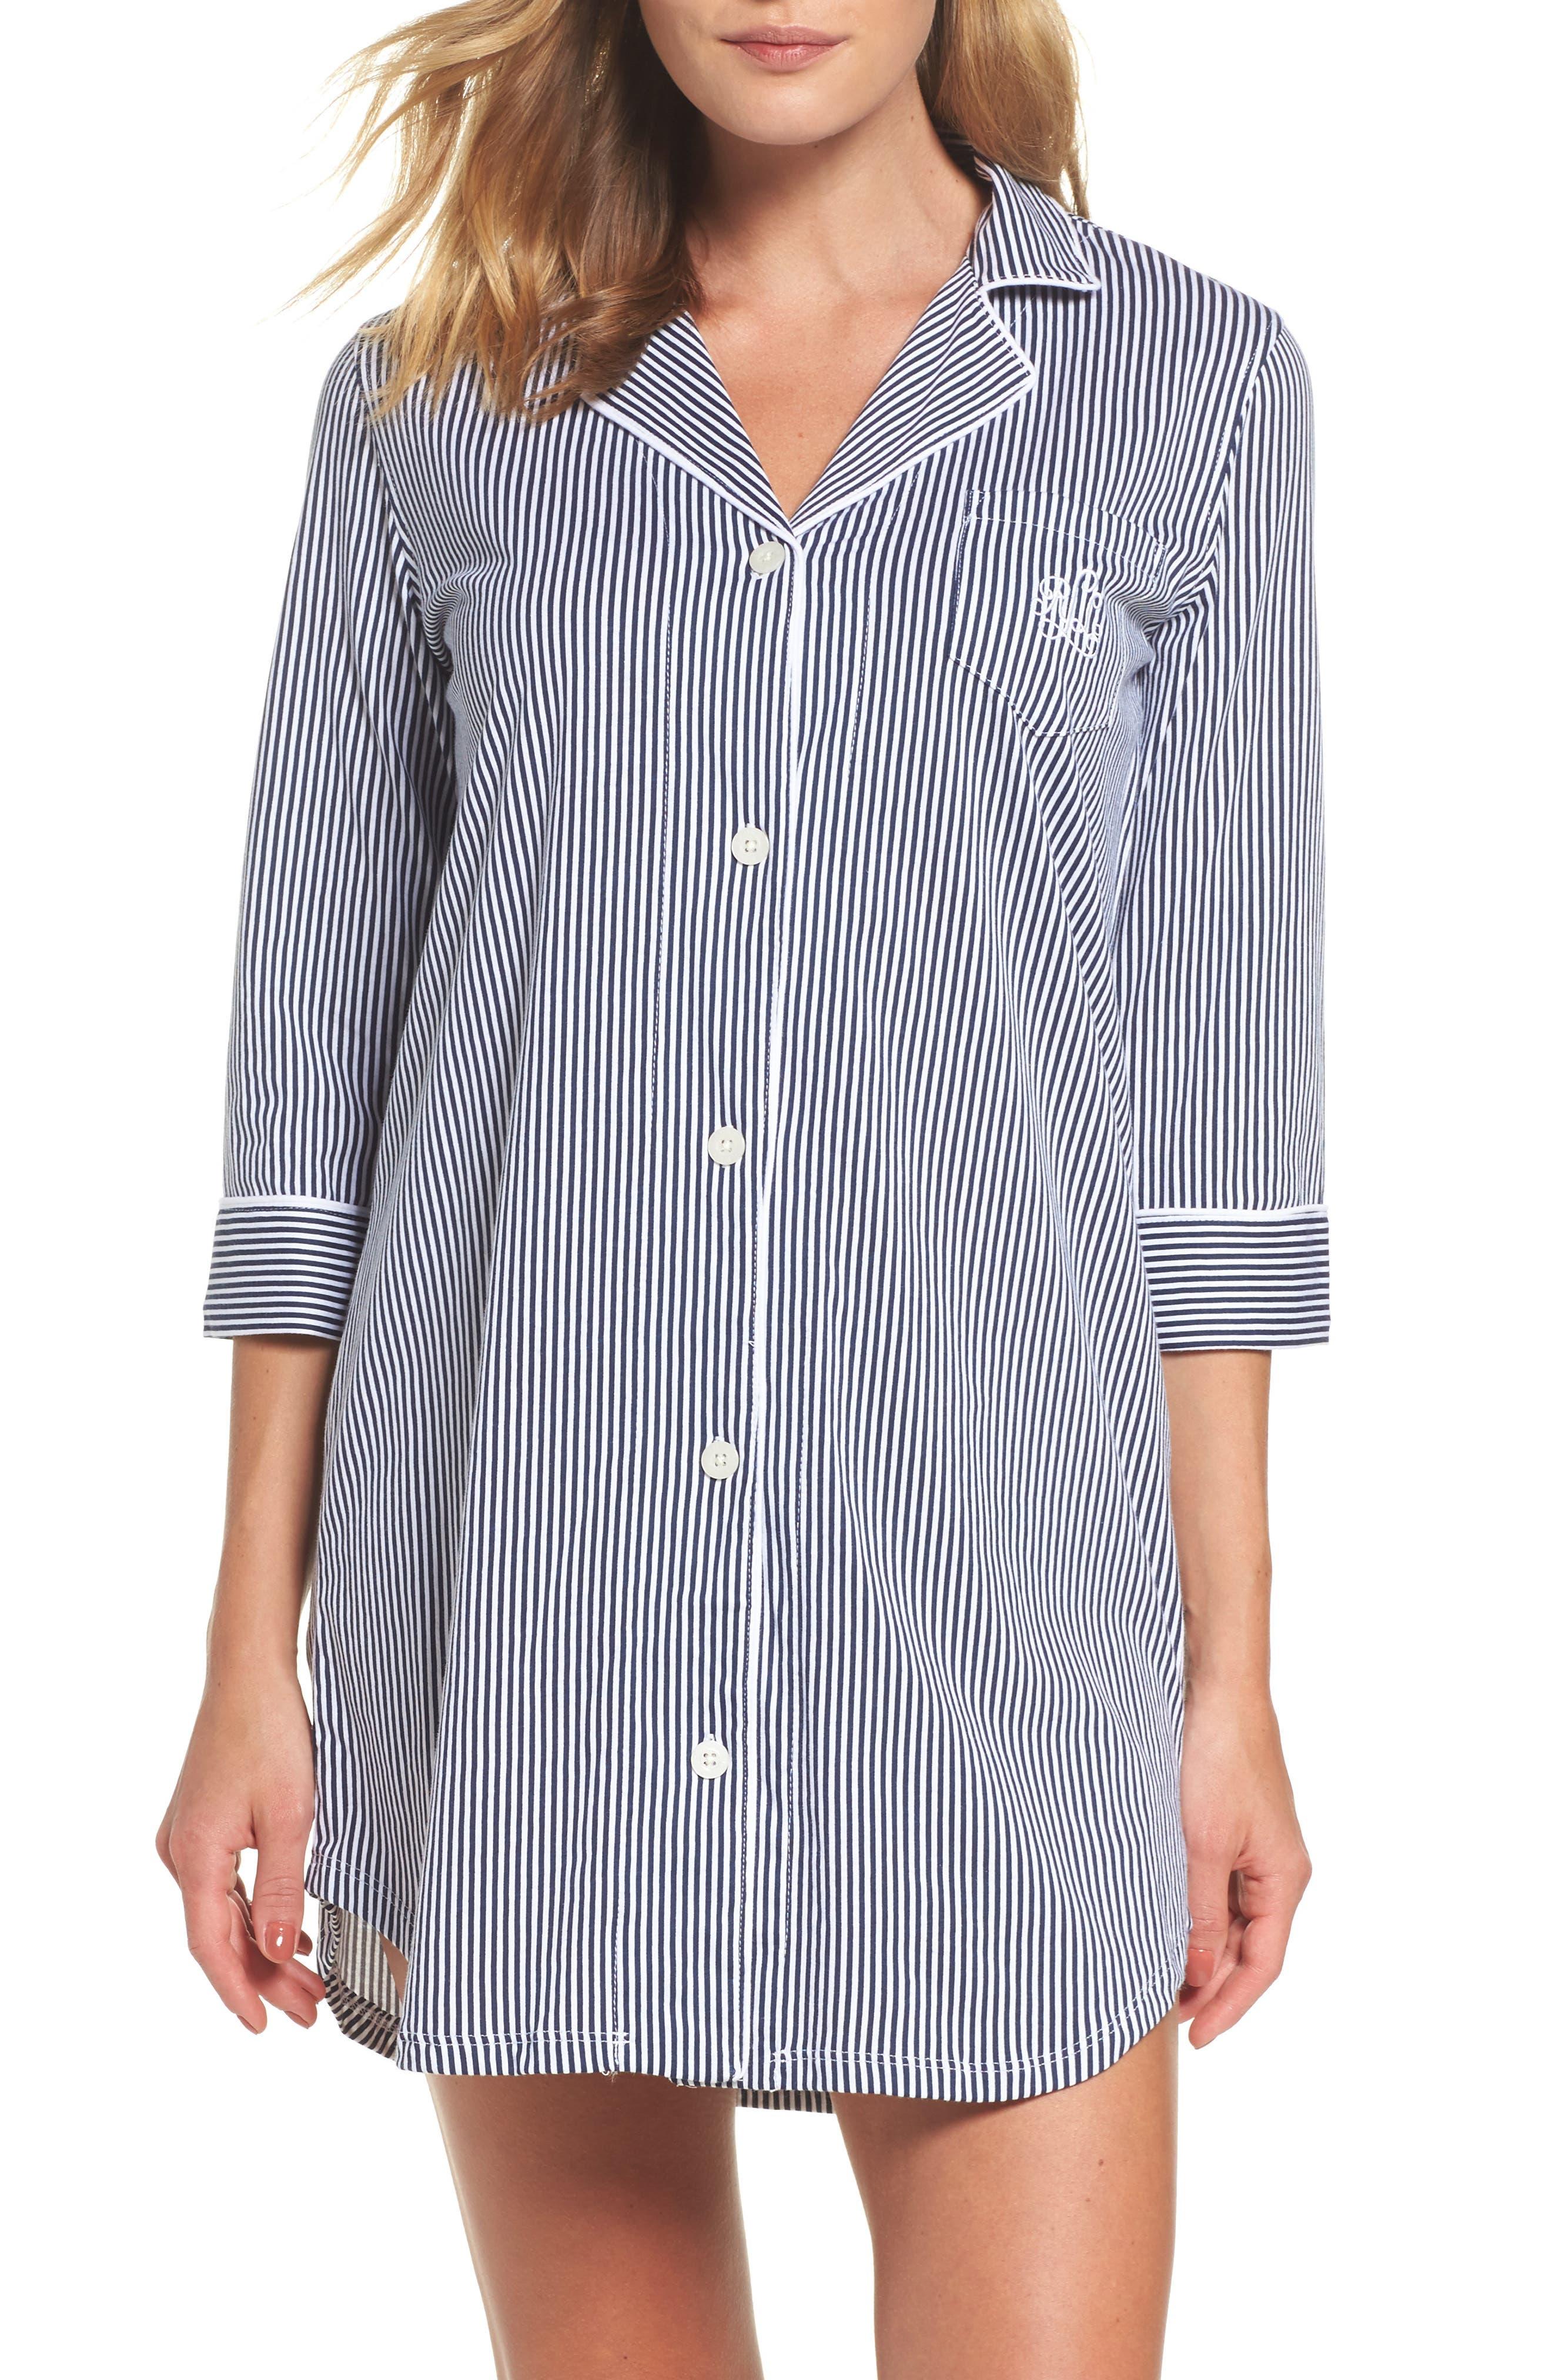 Jersey Sleep Shirt,                             Alternate thumbnail 10, color,